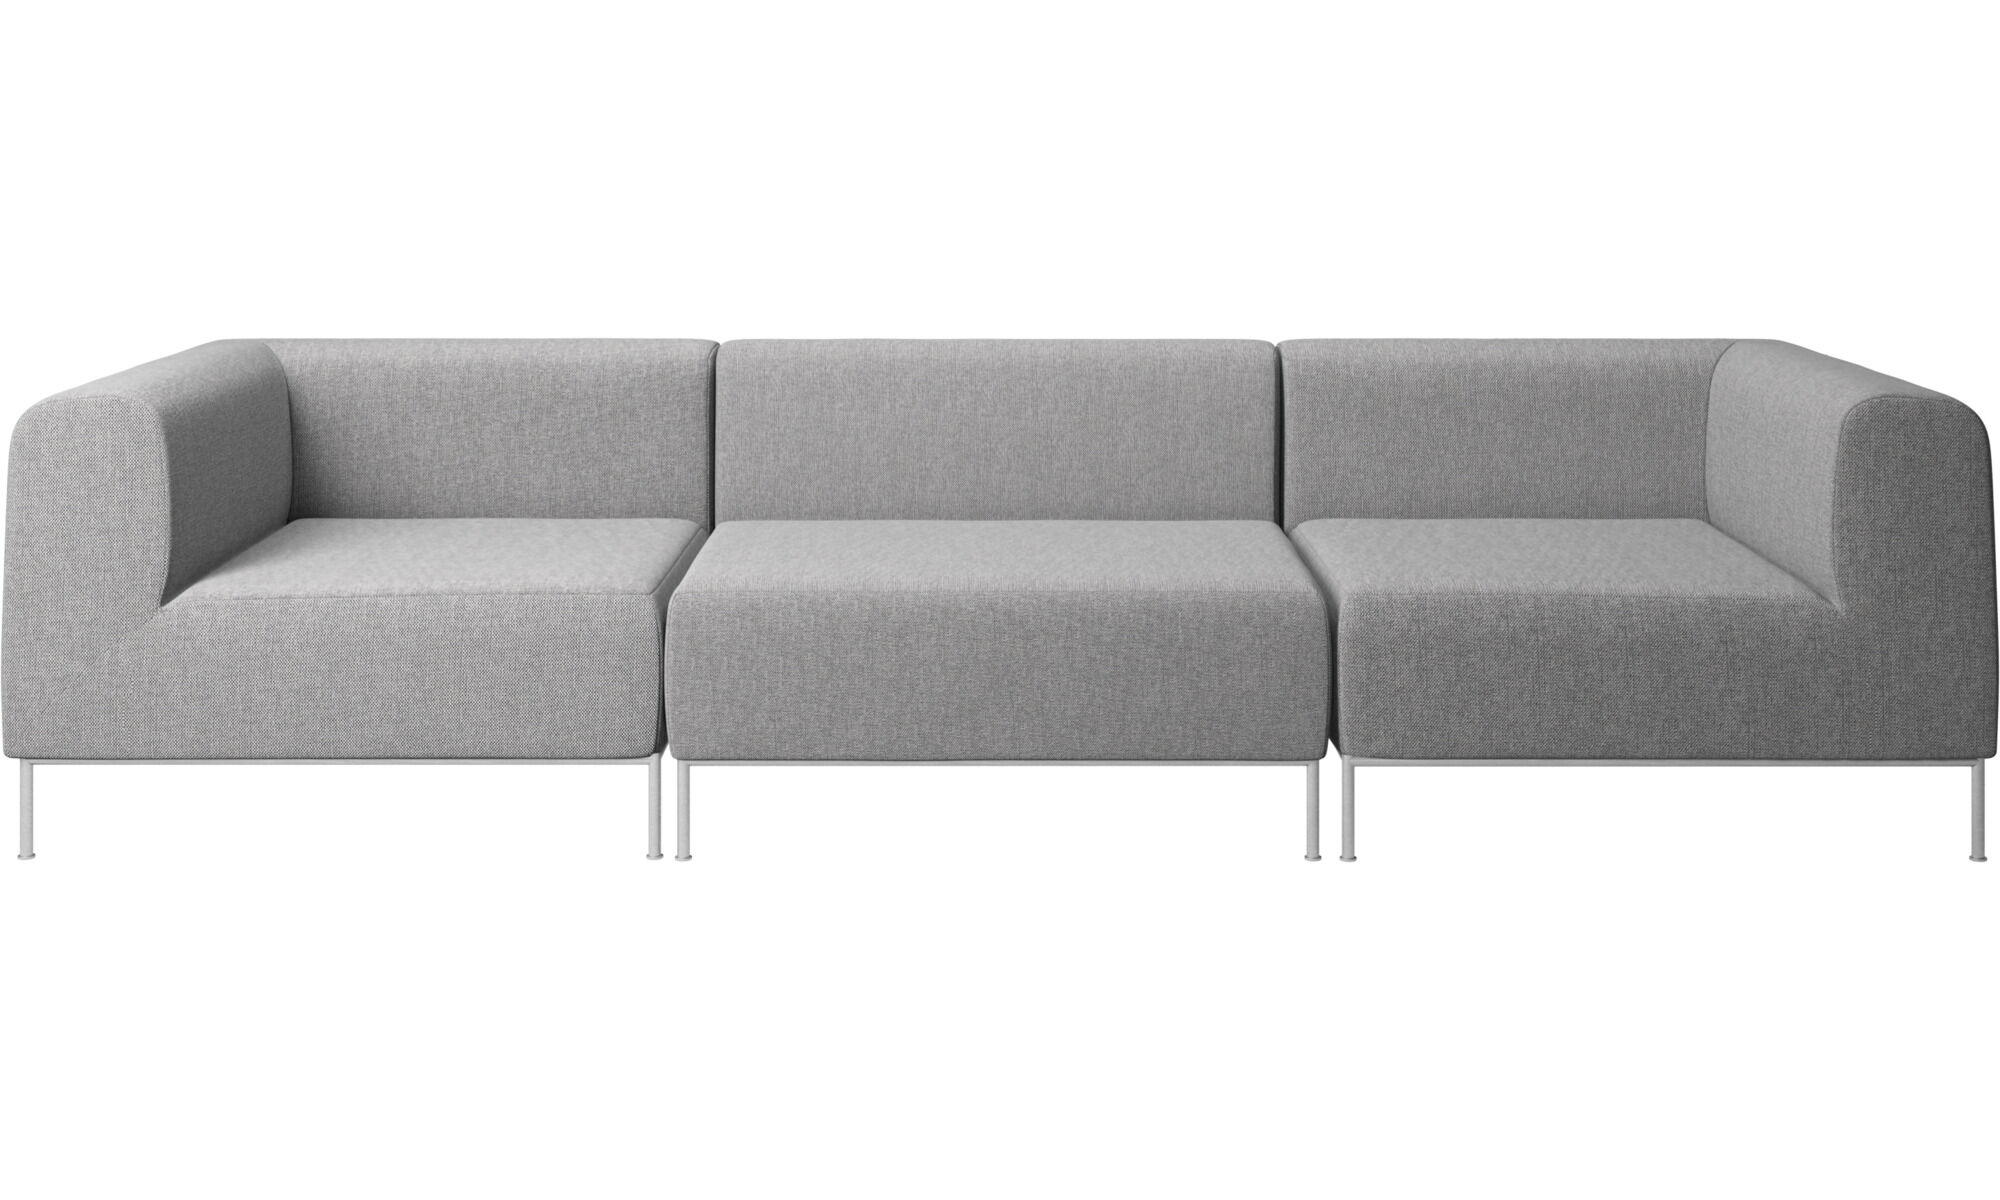 Modular Sofas   Miami Sofa   Gray   Fabric